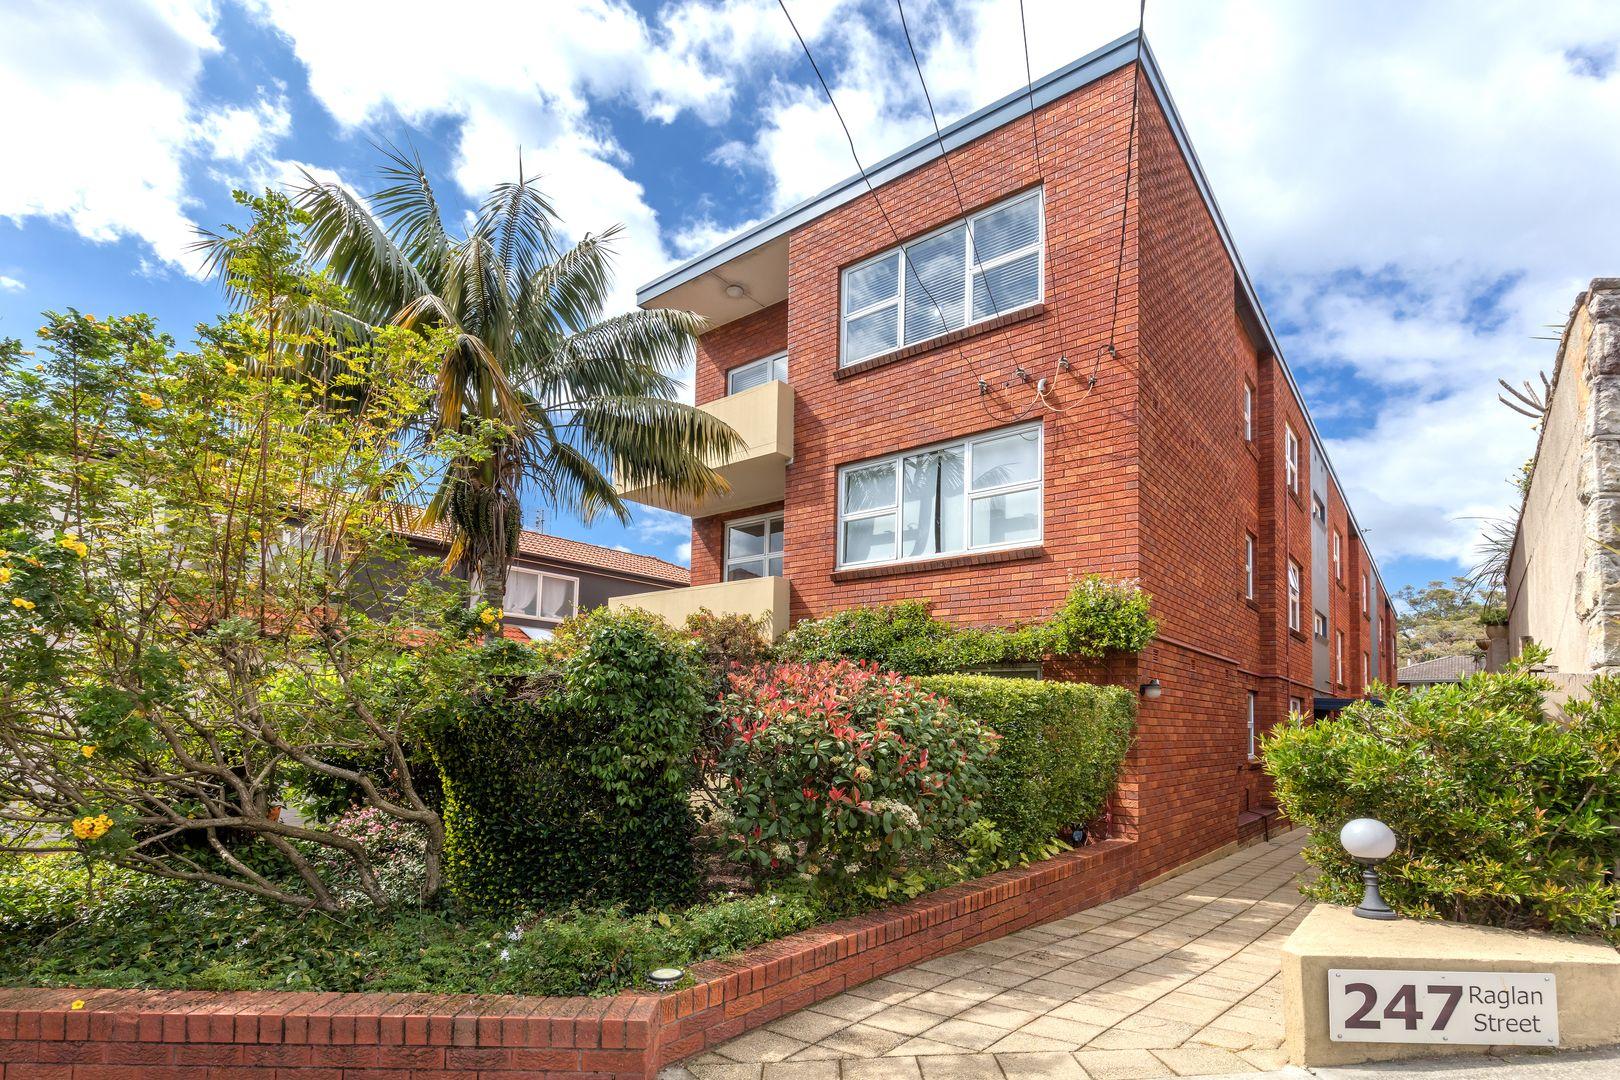 1/247 Raglan Street, Mosman NSW 2088, Image 0